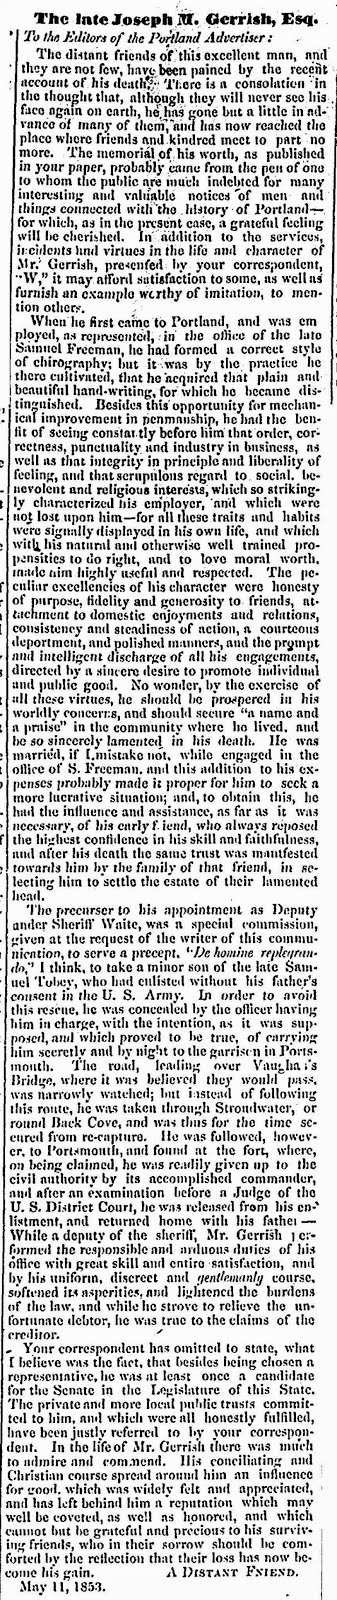 theraconteuseexpose gerrish line part joseph merriner gerrish date tuesday 20 1838 paper portland weekly advertiser portland me volume xl issue 20 page 4